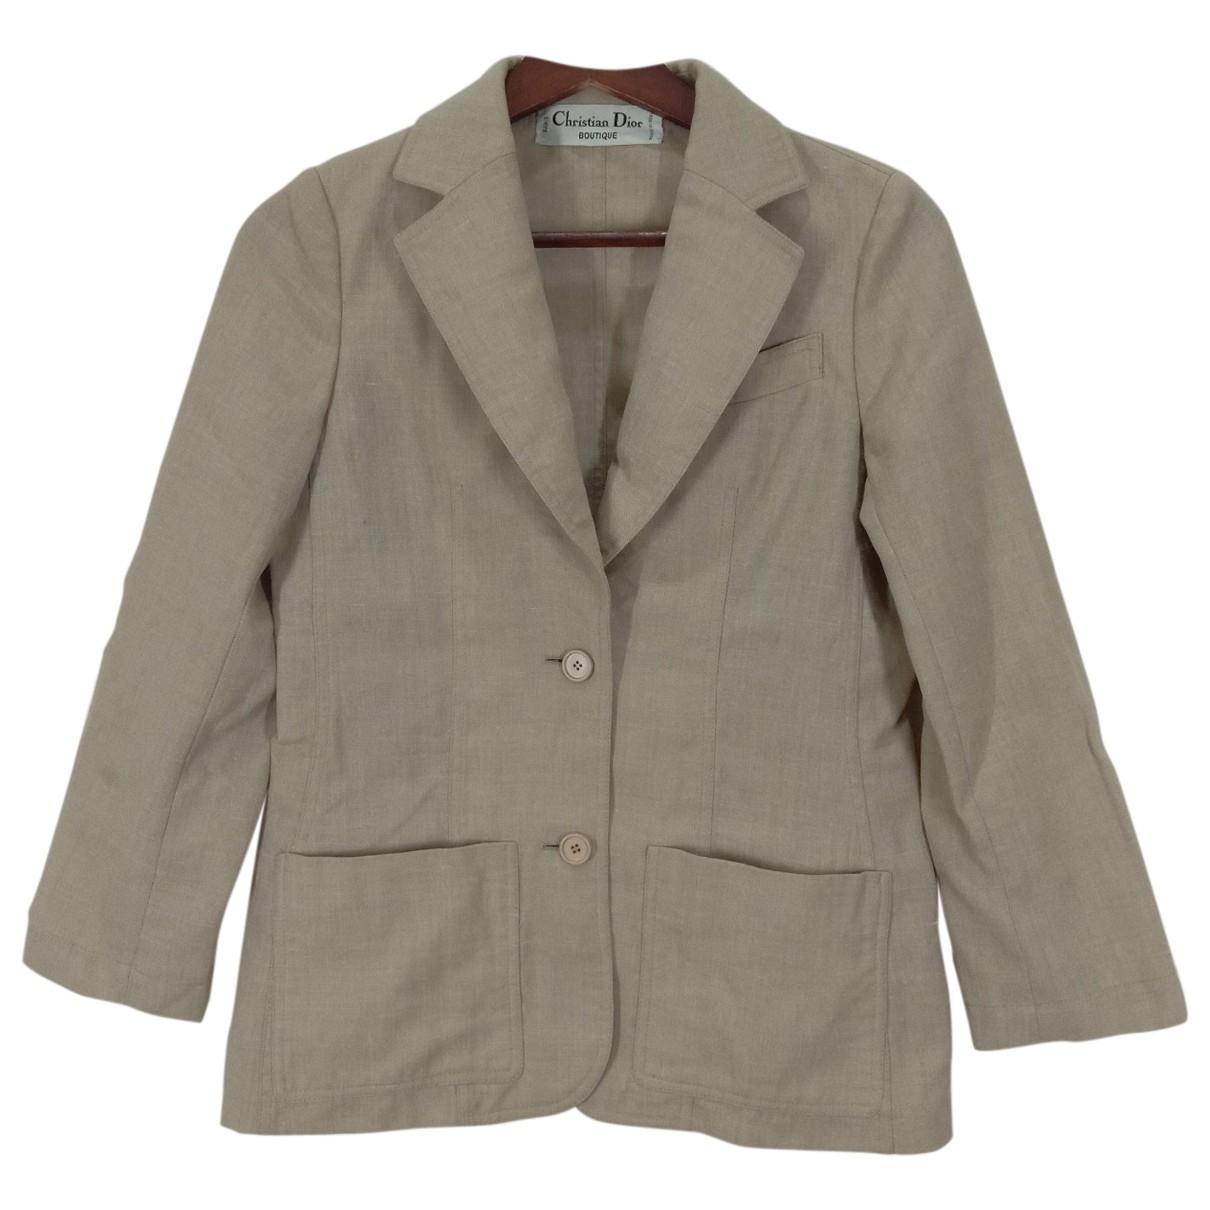 Dior \N Brown Cotton jacket for Women S International